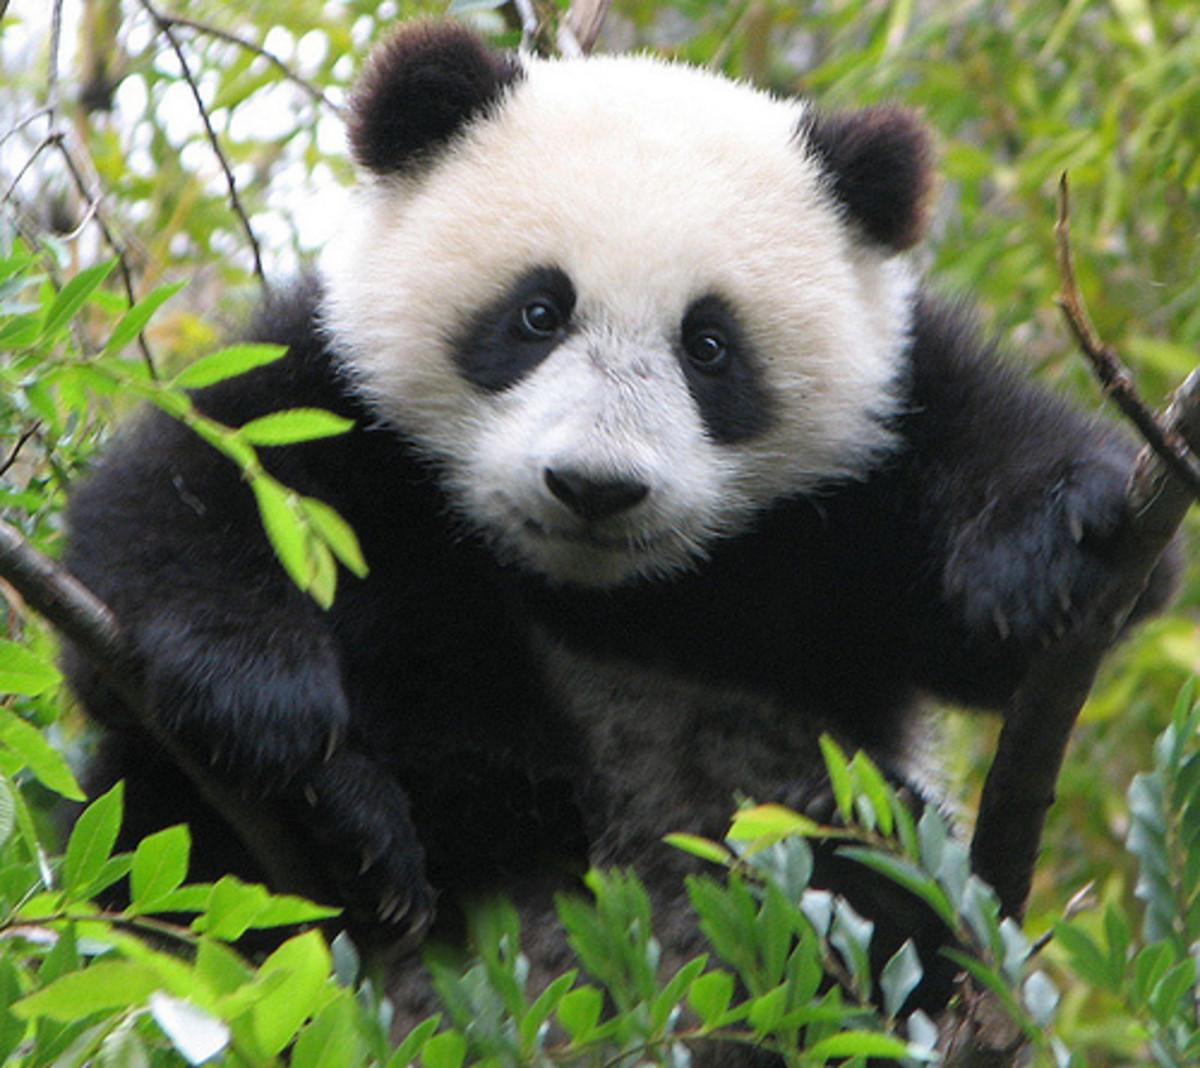 Photo Series-Panda Bears